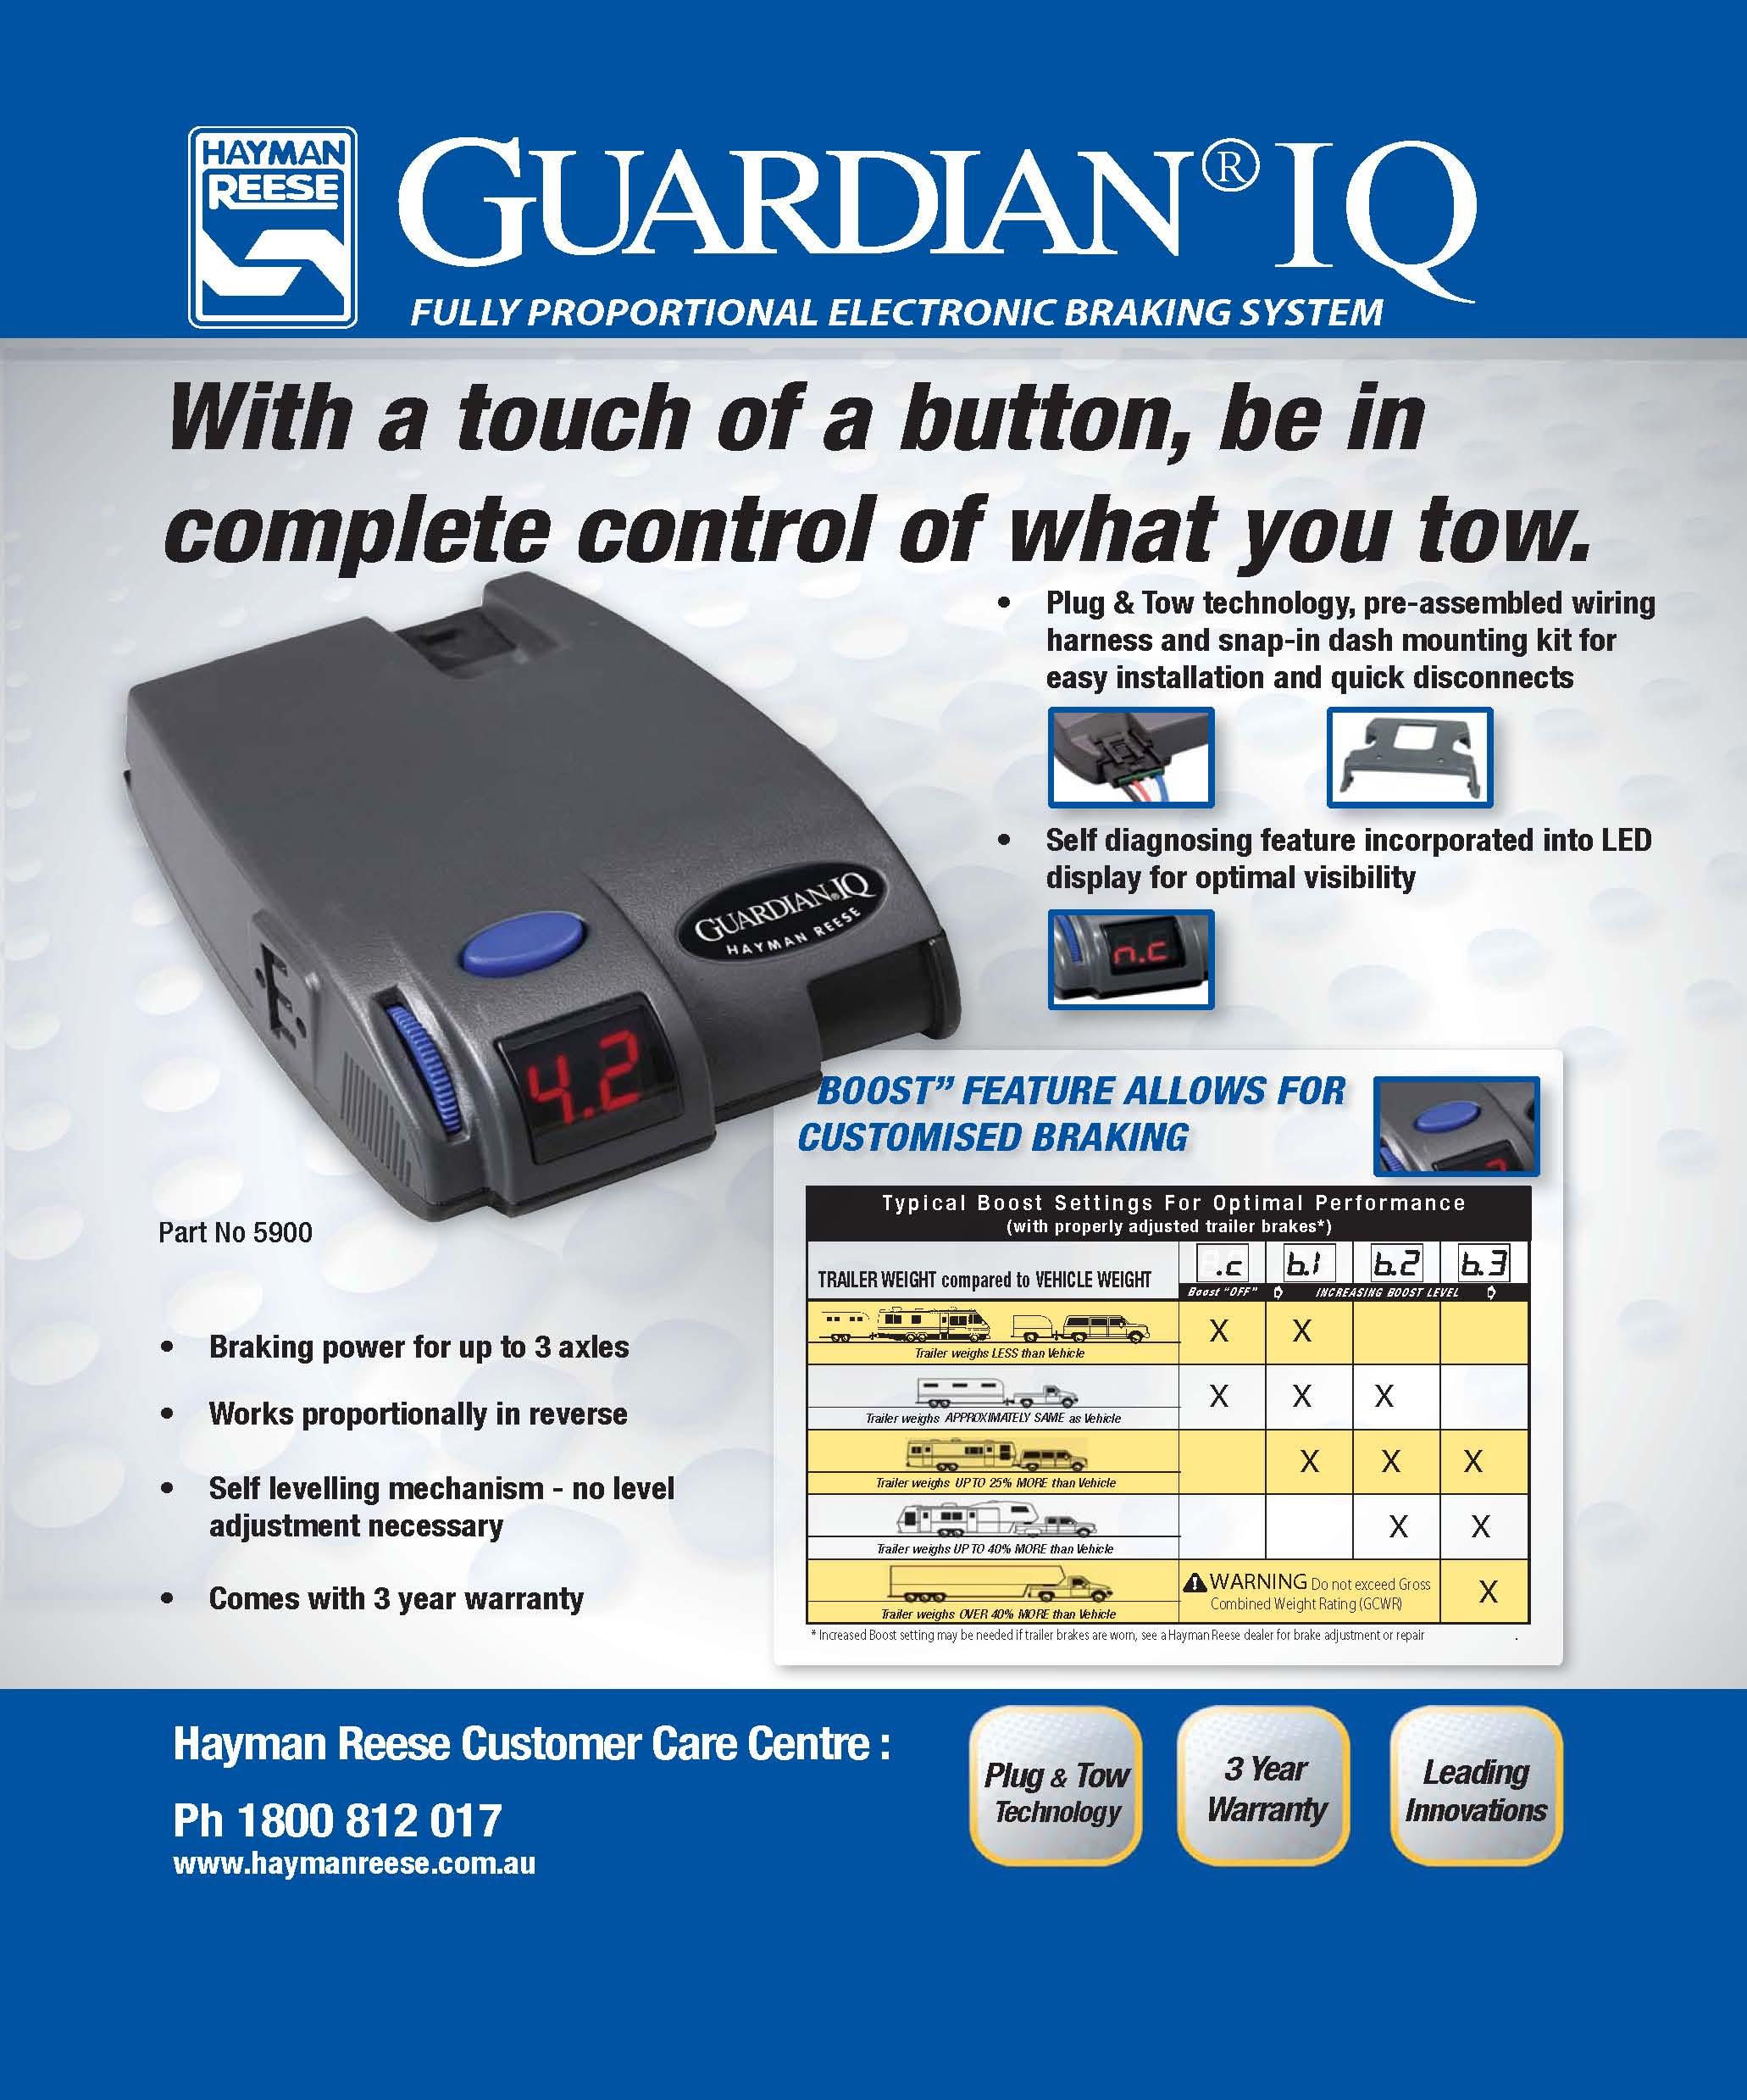 Guardian IQ index of downloads hayman reese guardian iq wiring diagram at honlapkeszites.co